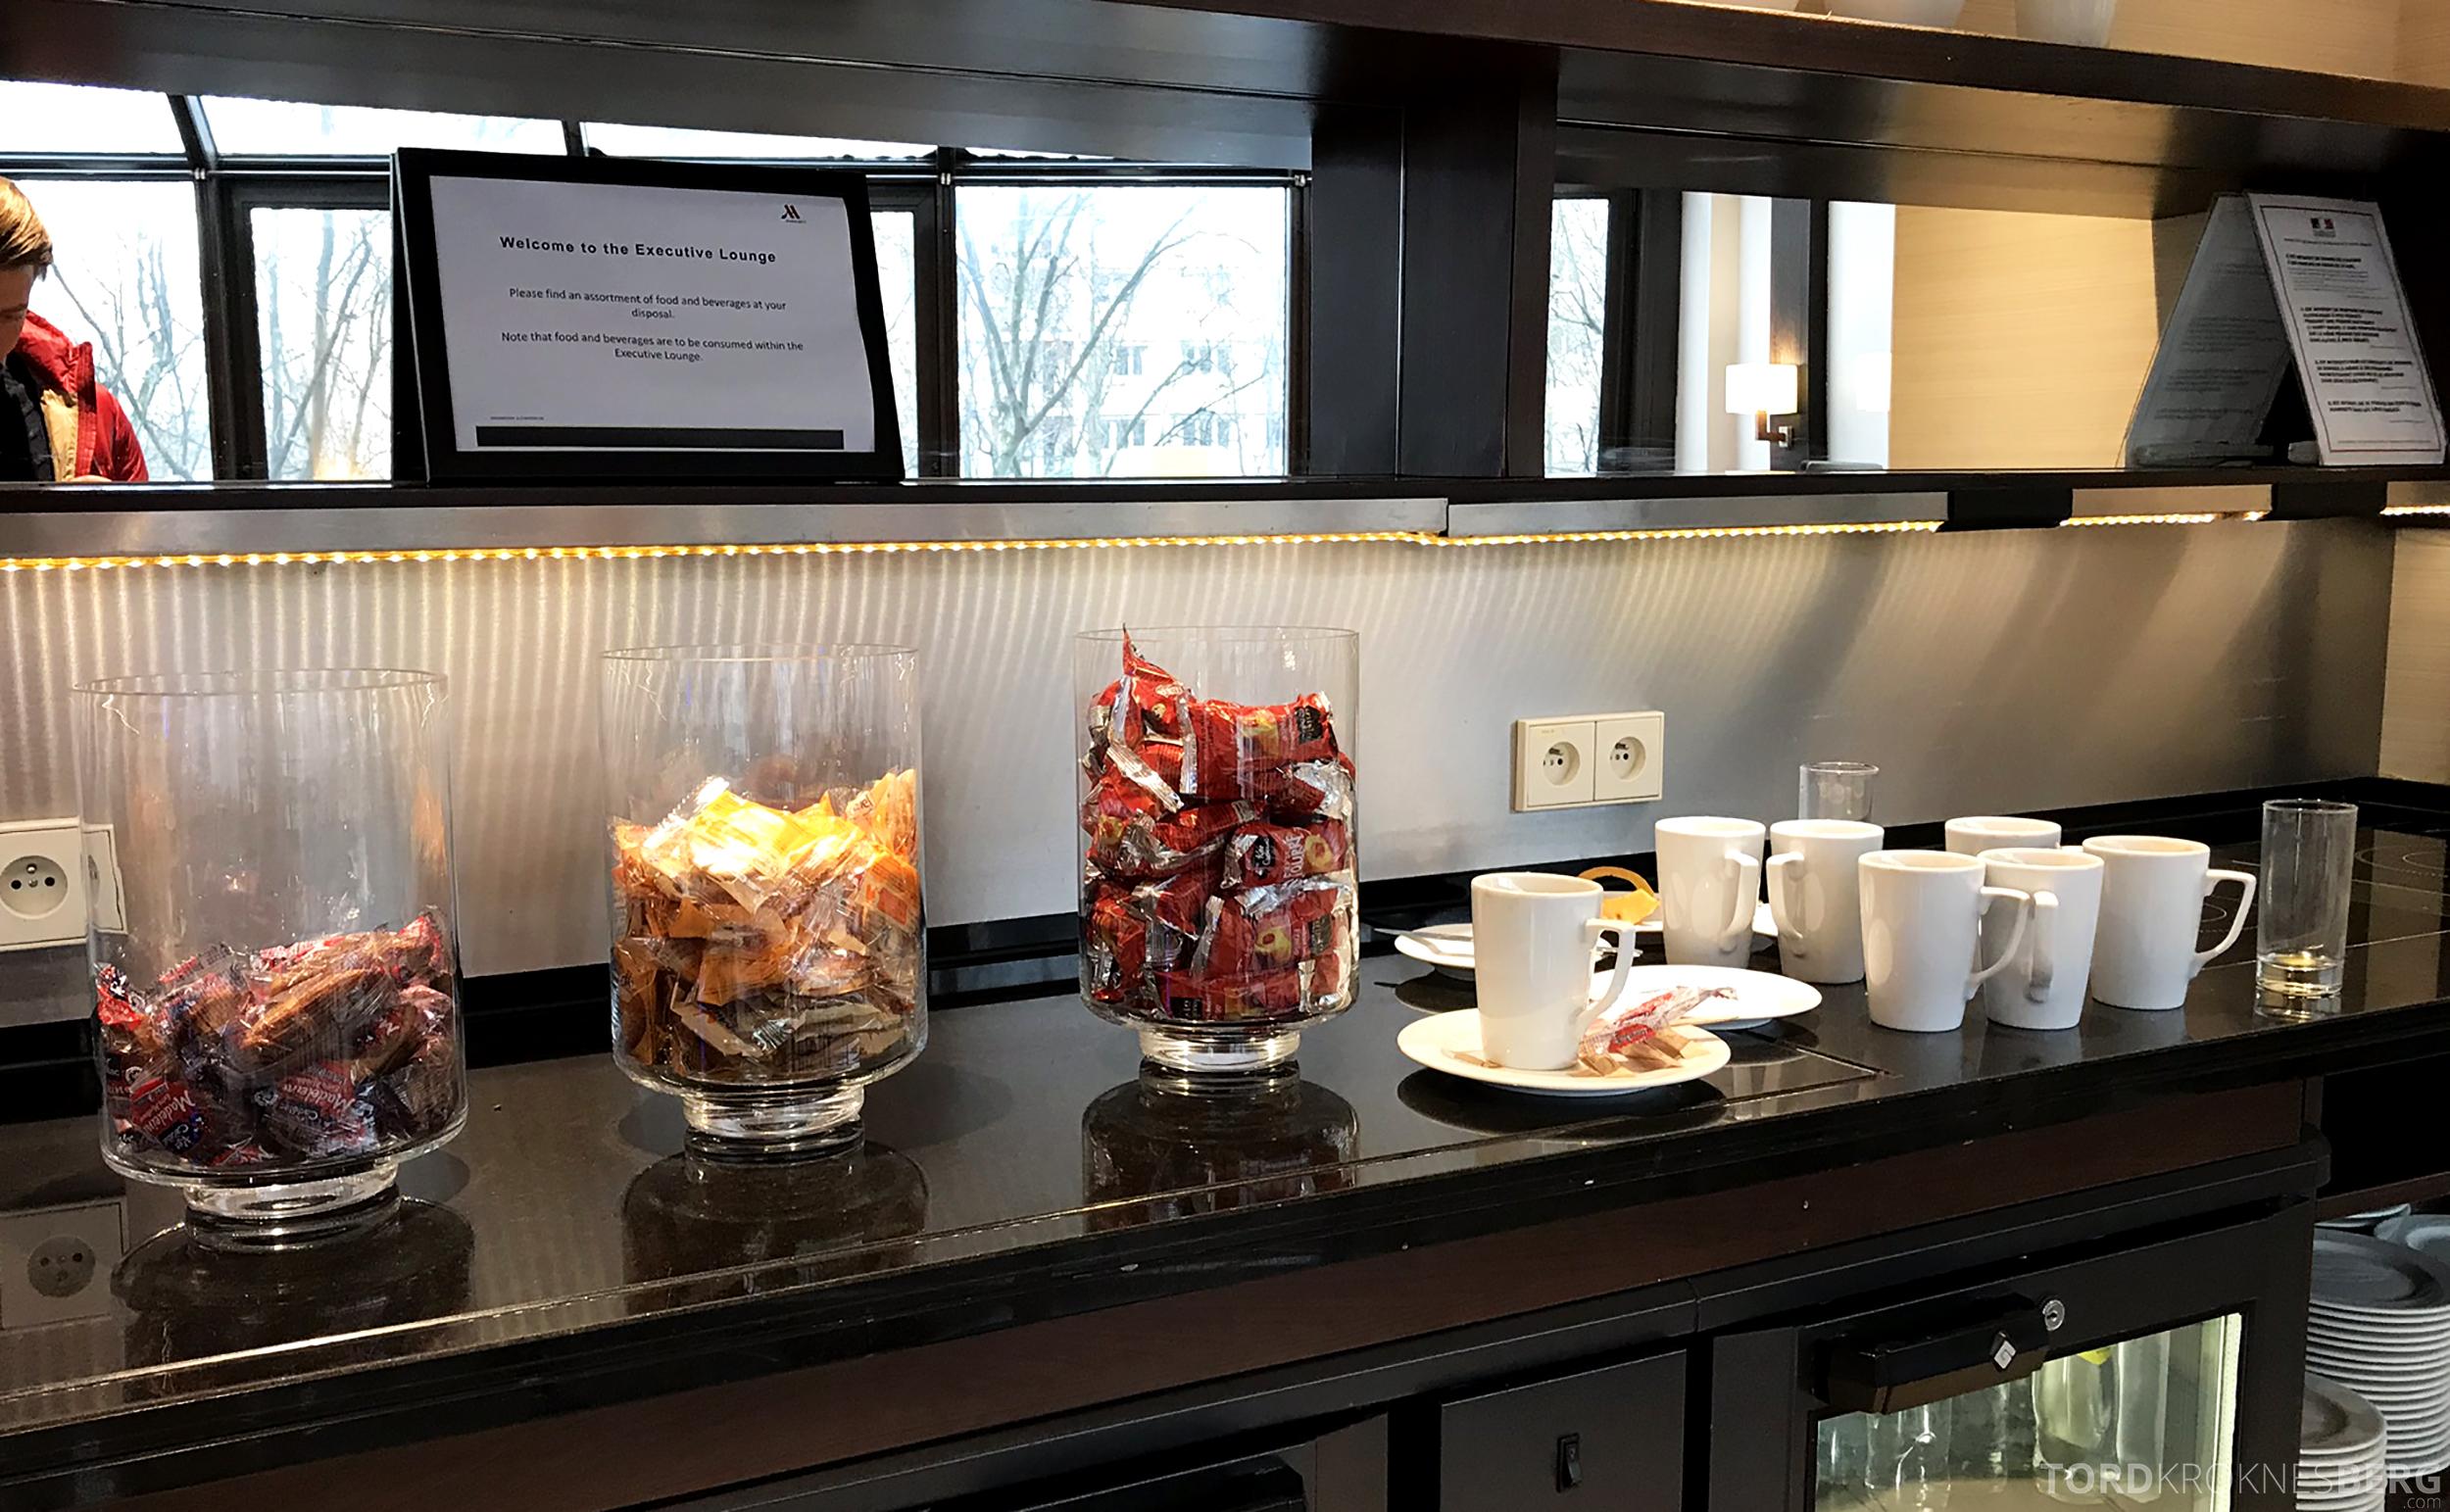 Marriott Paris Rive Gauche Executive Lounge snacks